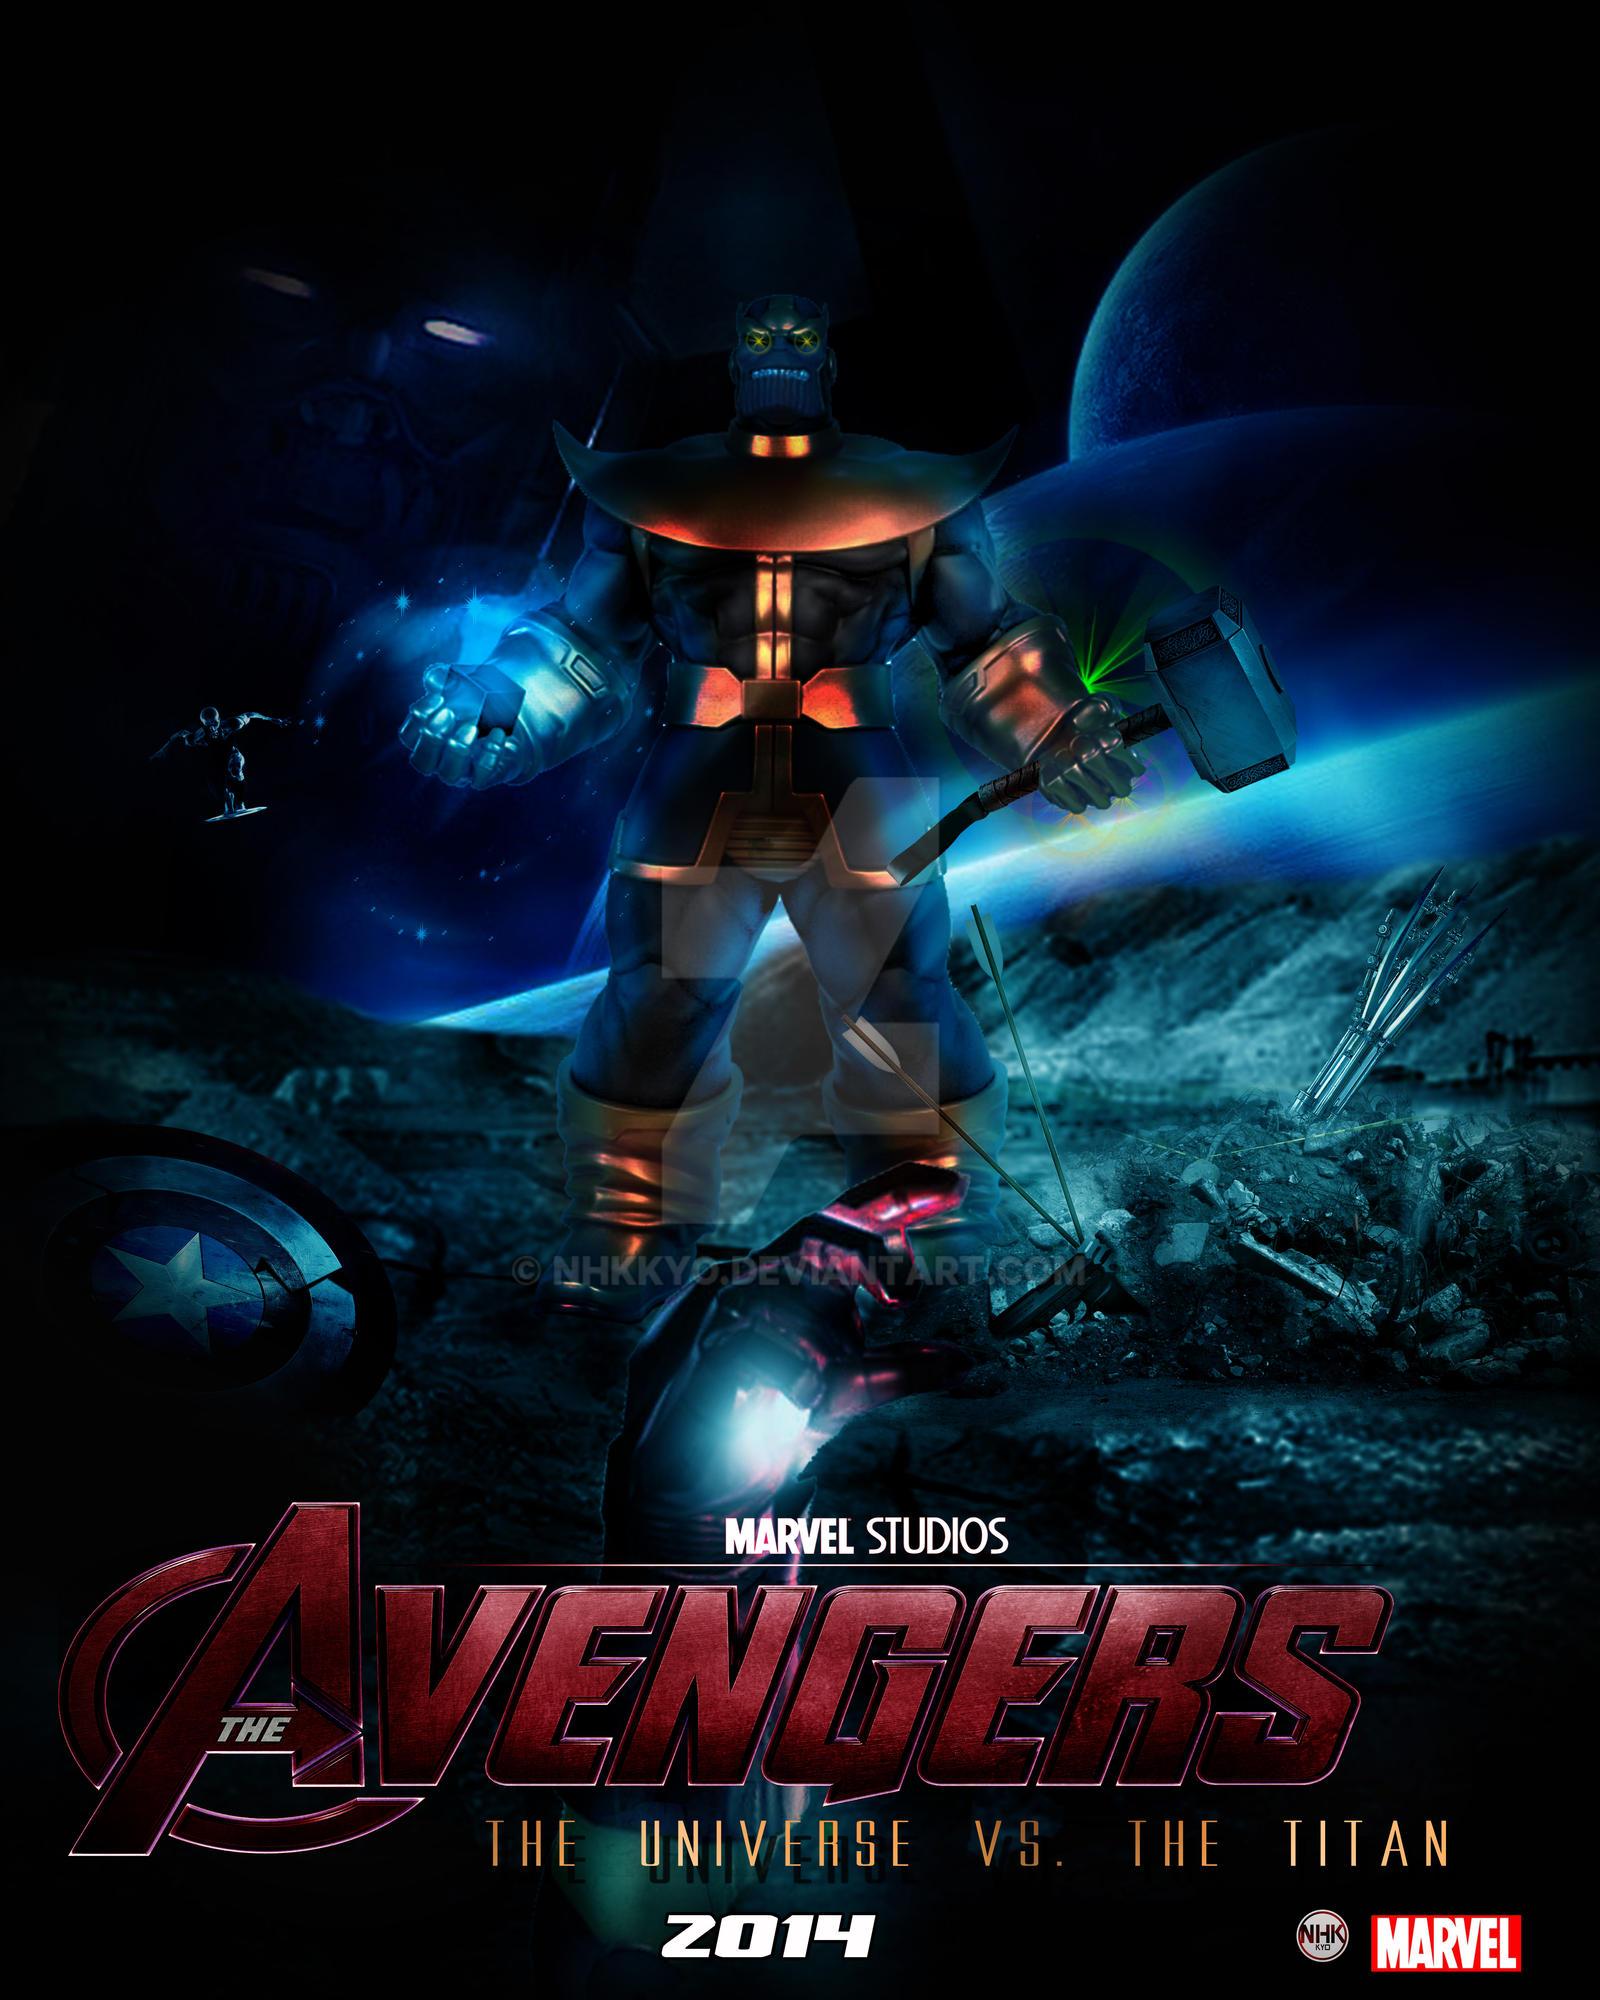 avengers VS thanos - Collaboratables by NHKkyo on DeviantArt